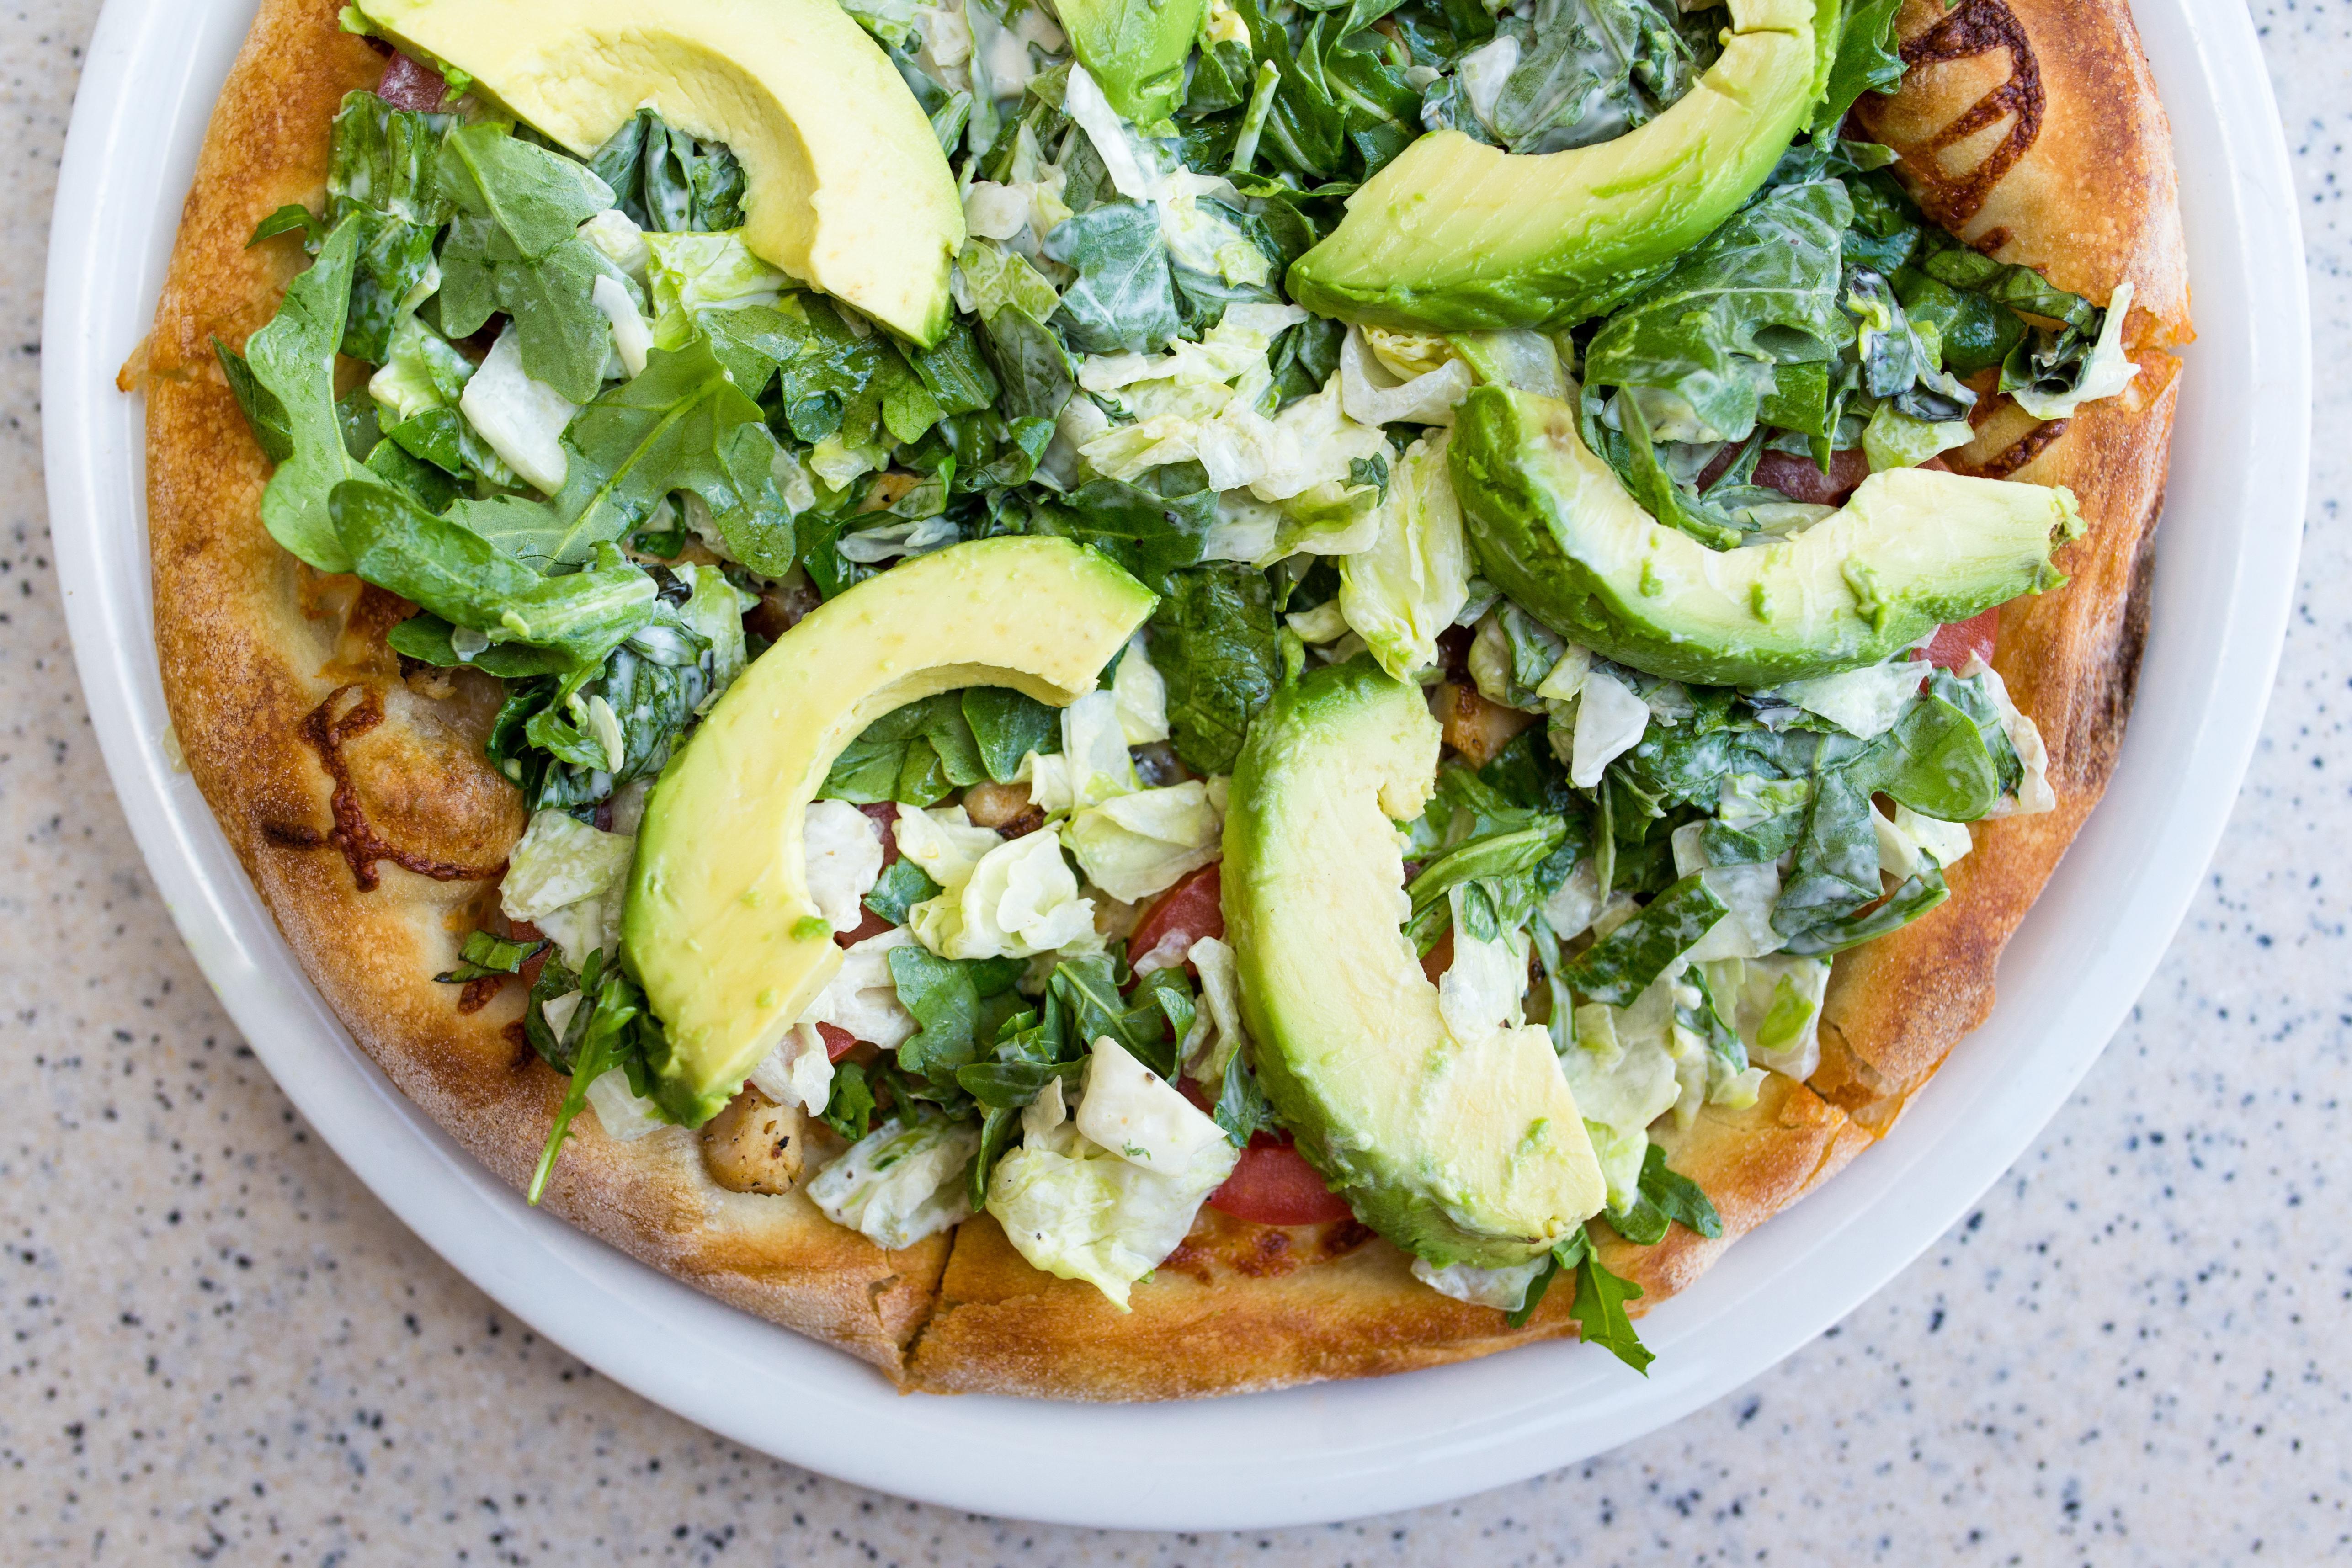 California Pizza Kitchen Delivery Menu Locations Near You